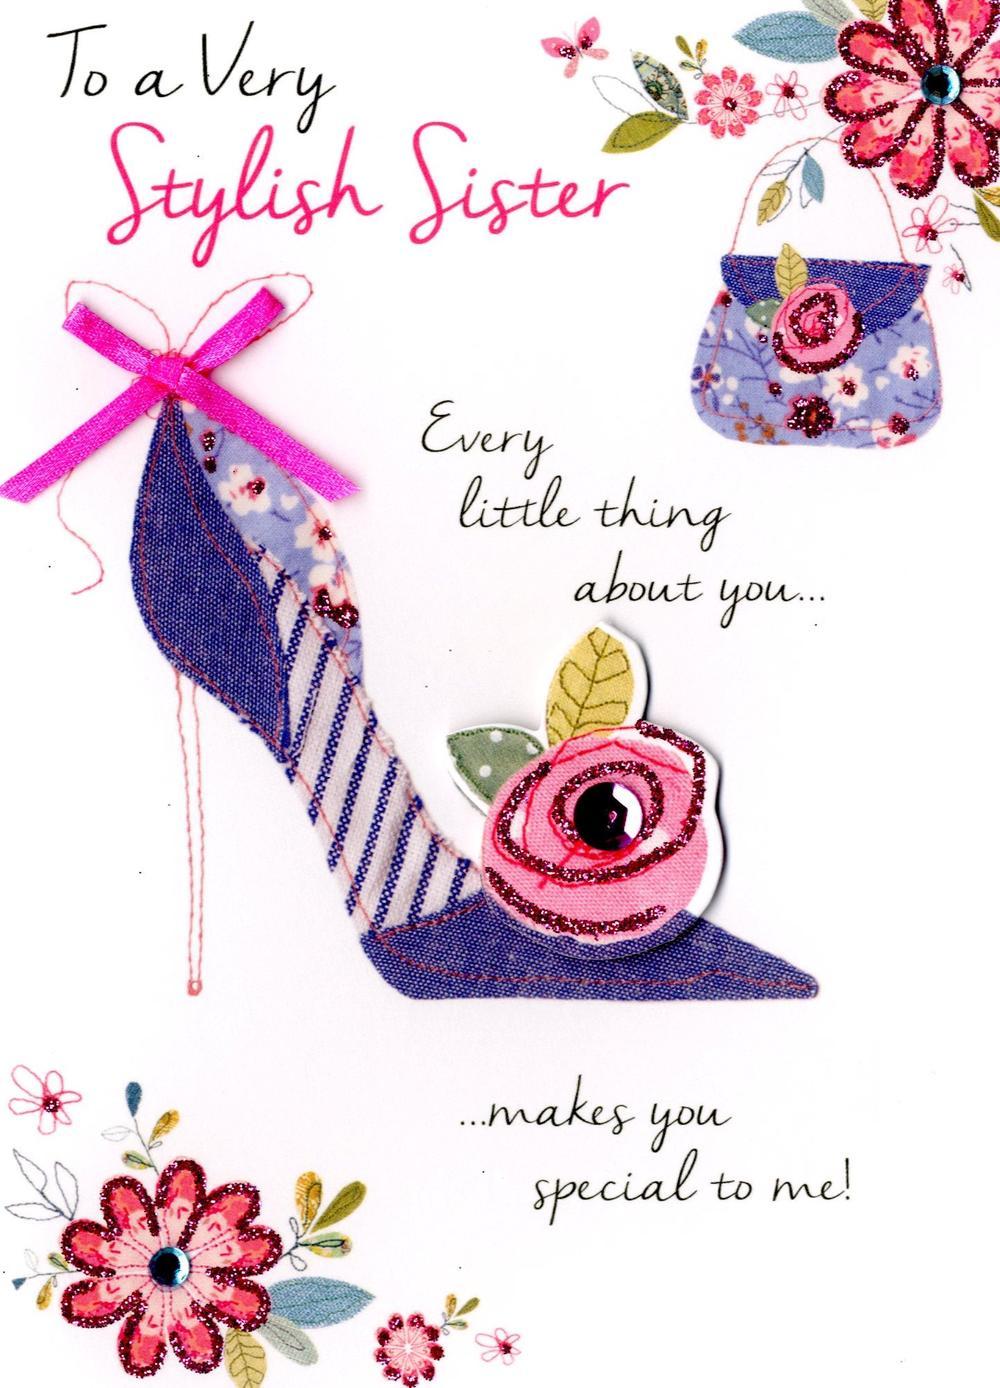 Very Stylish Sister Birthday Greeting Card